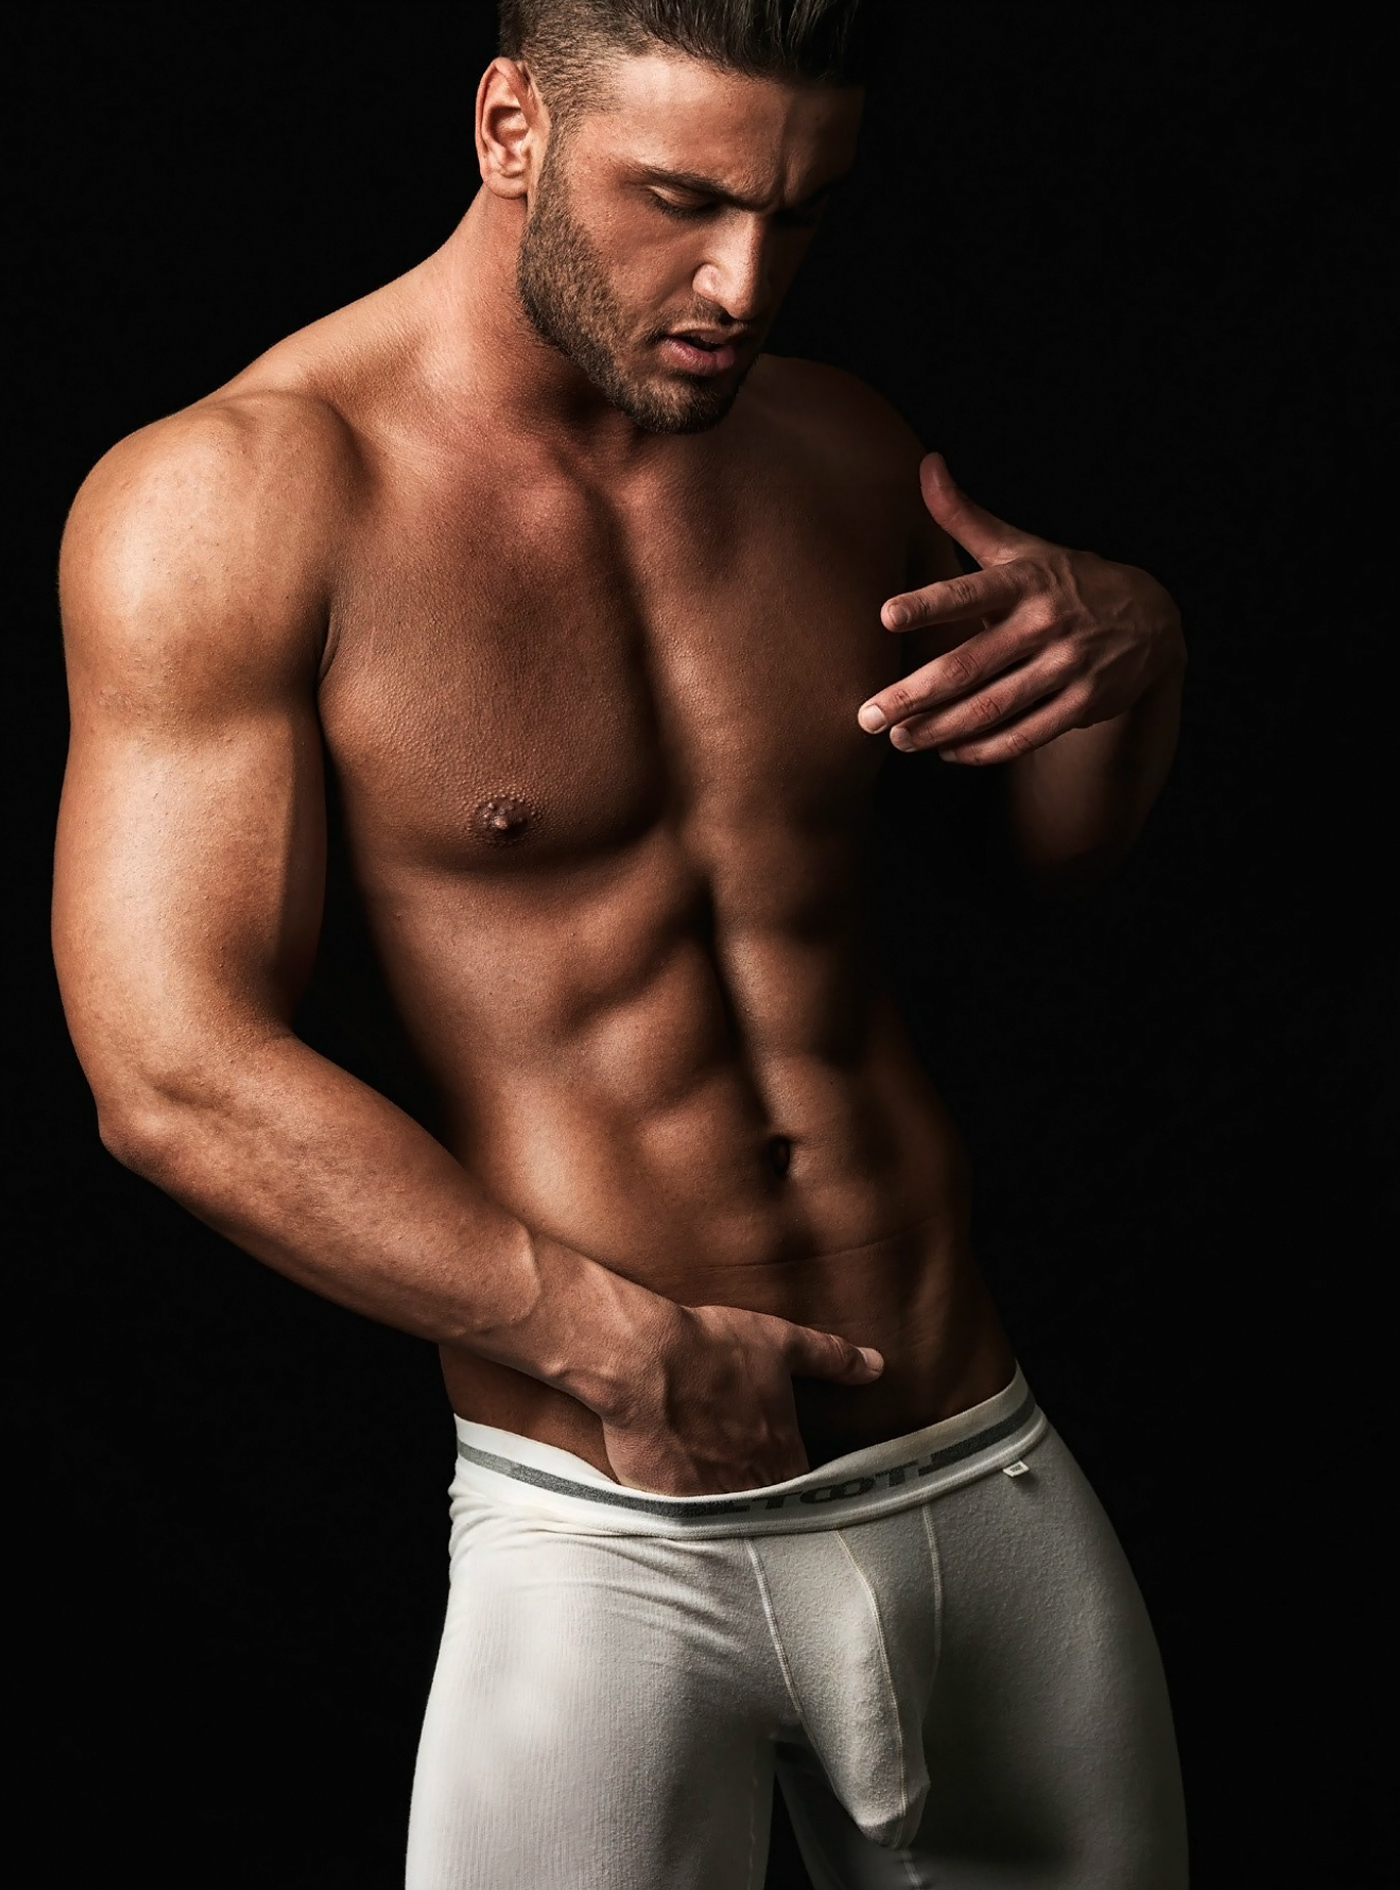 foto-italian-hot-naked-man-black-naked-army-women